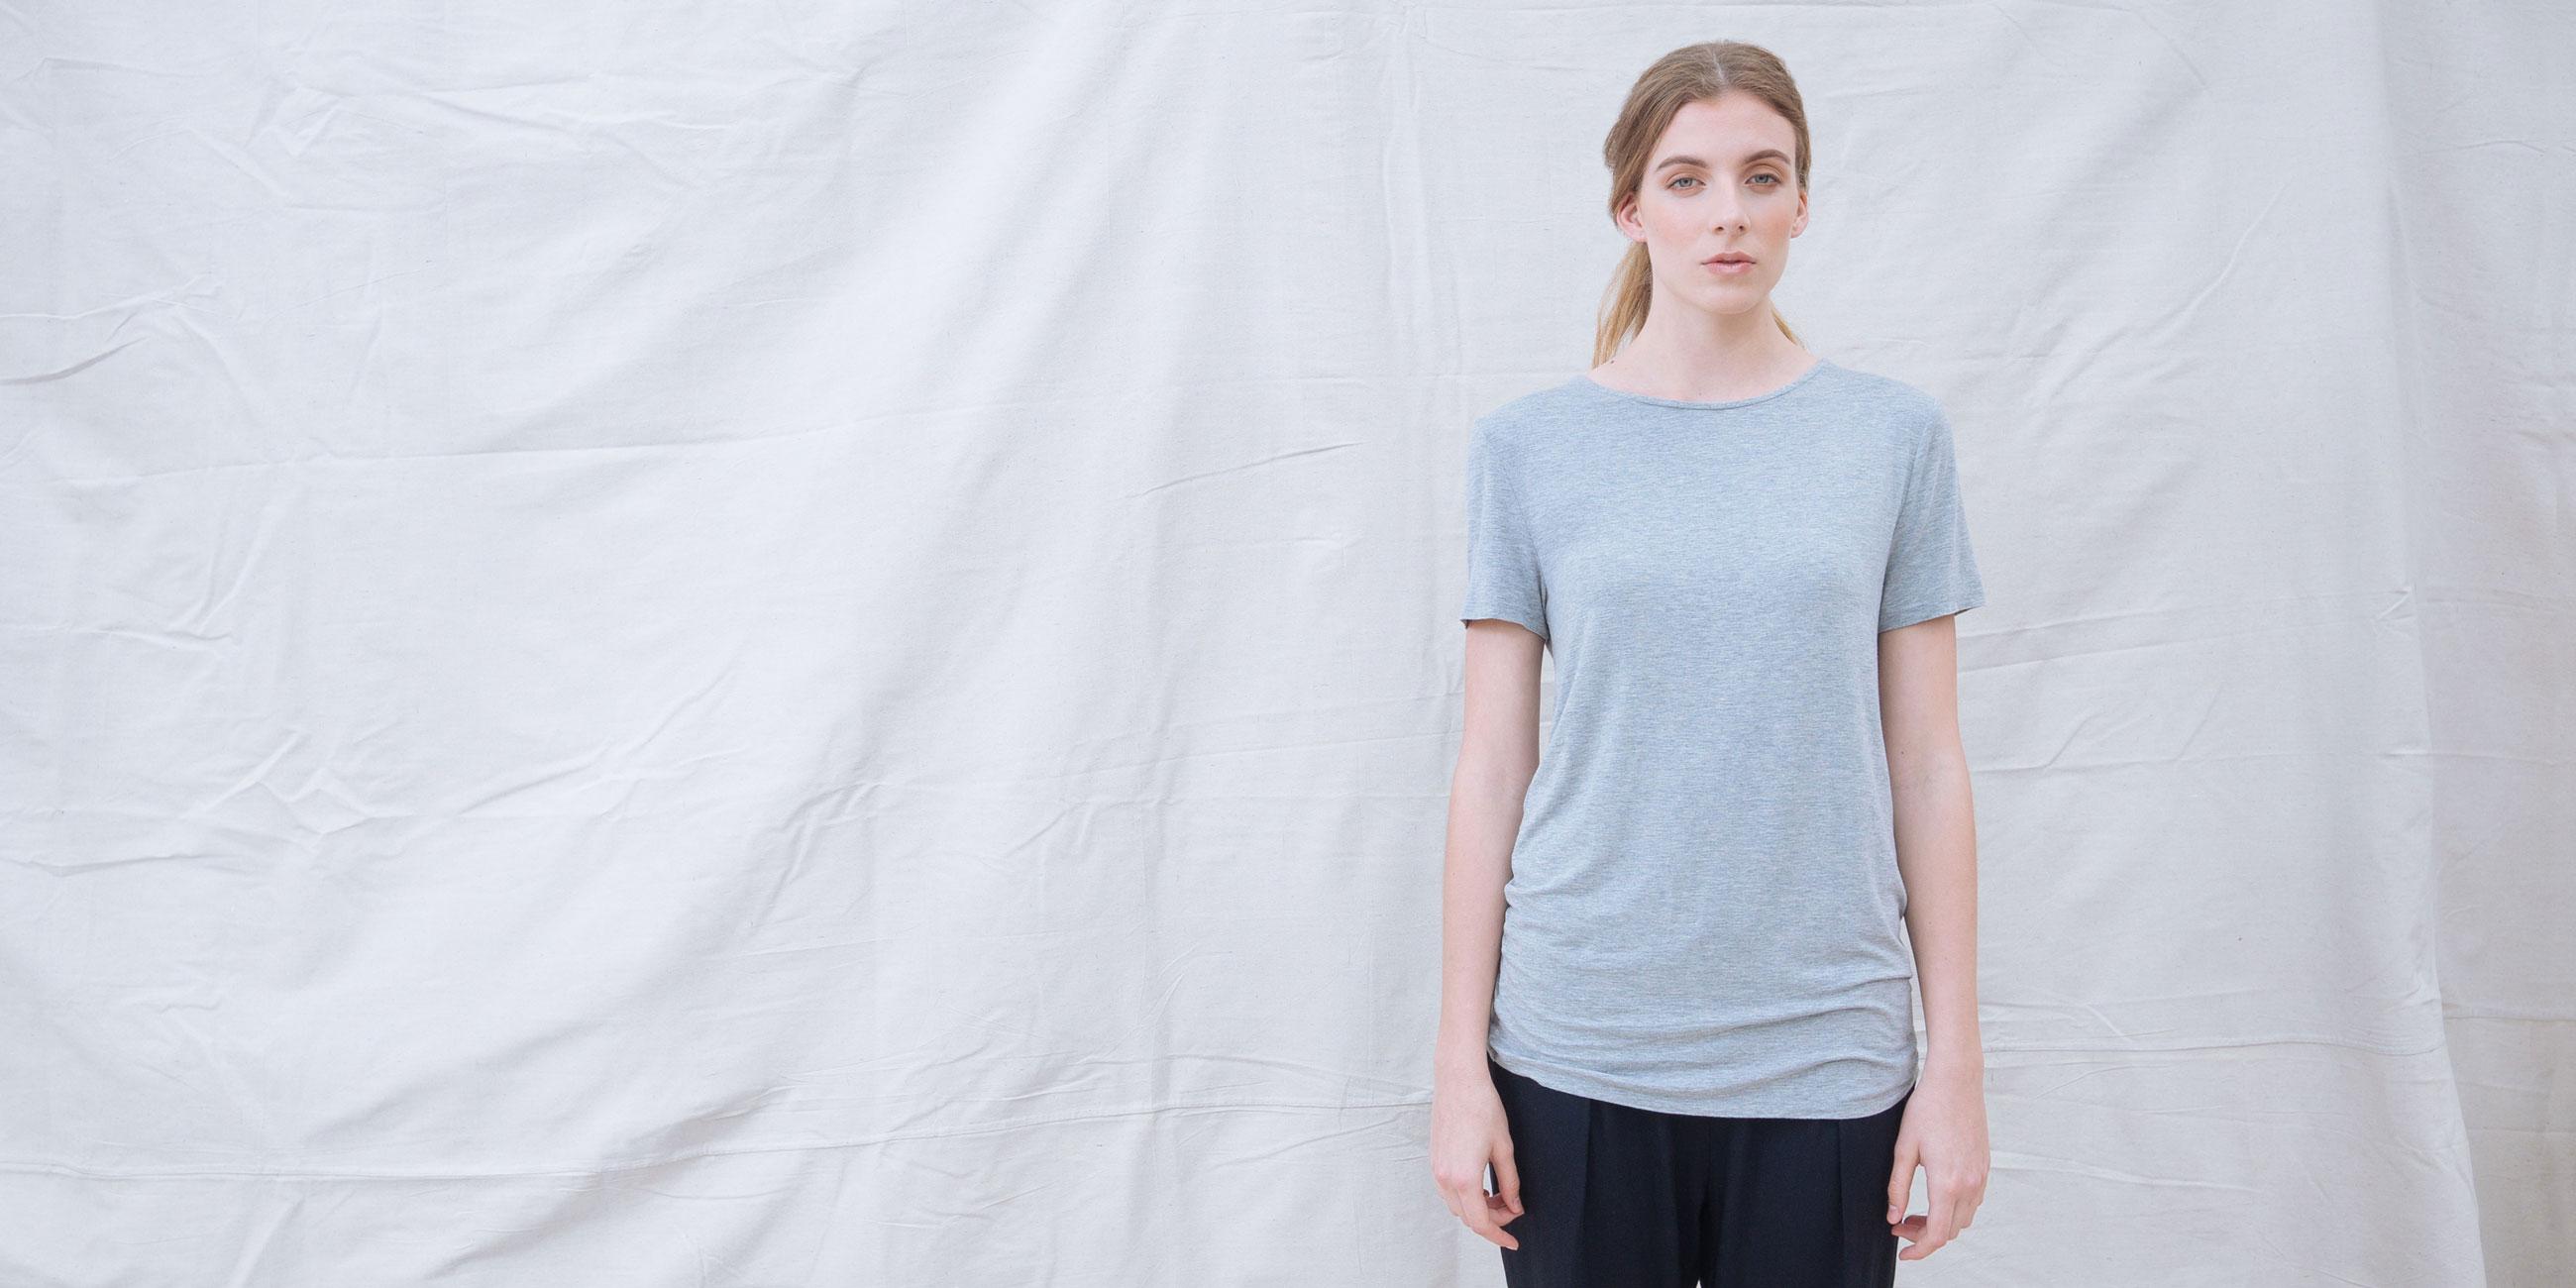 Bamboo Top Short Sleeve Luna Grey  1